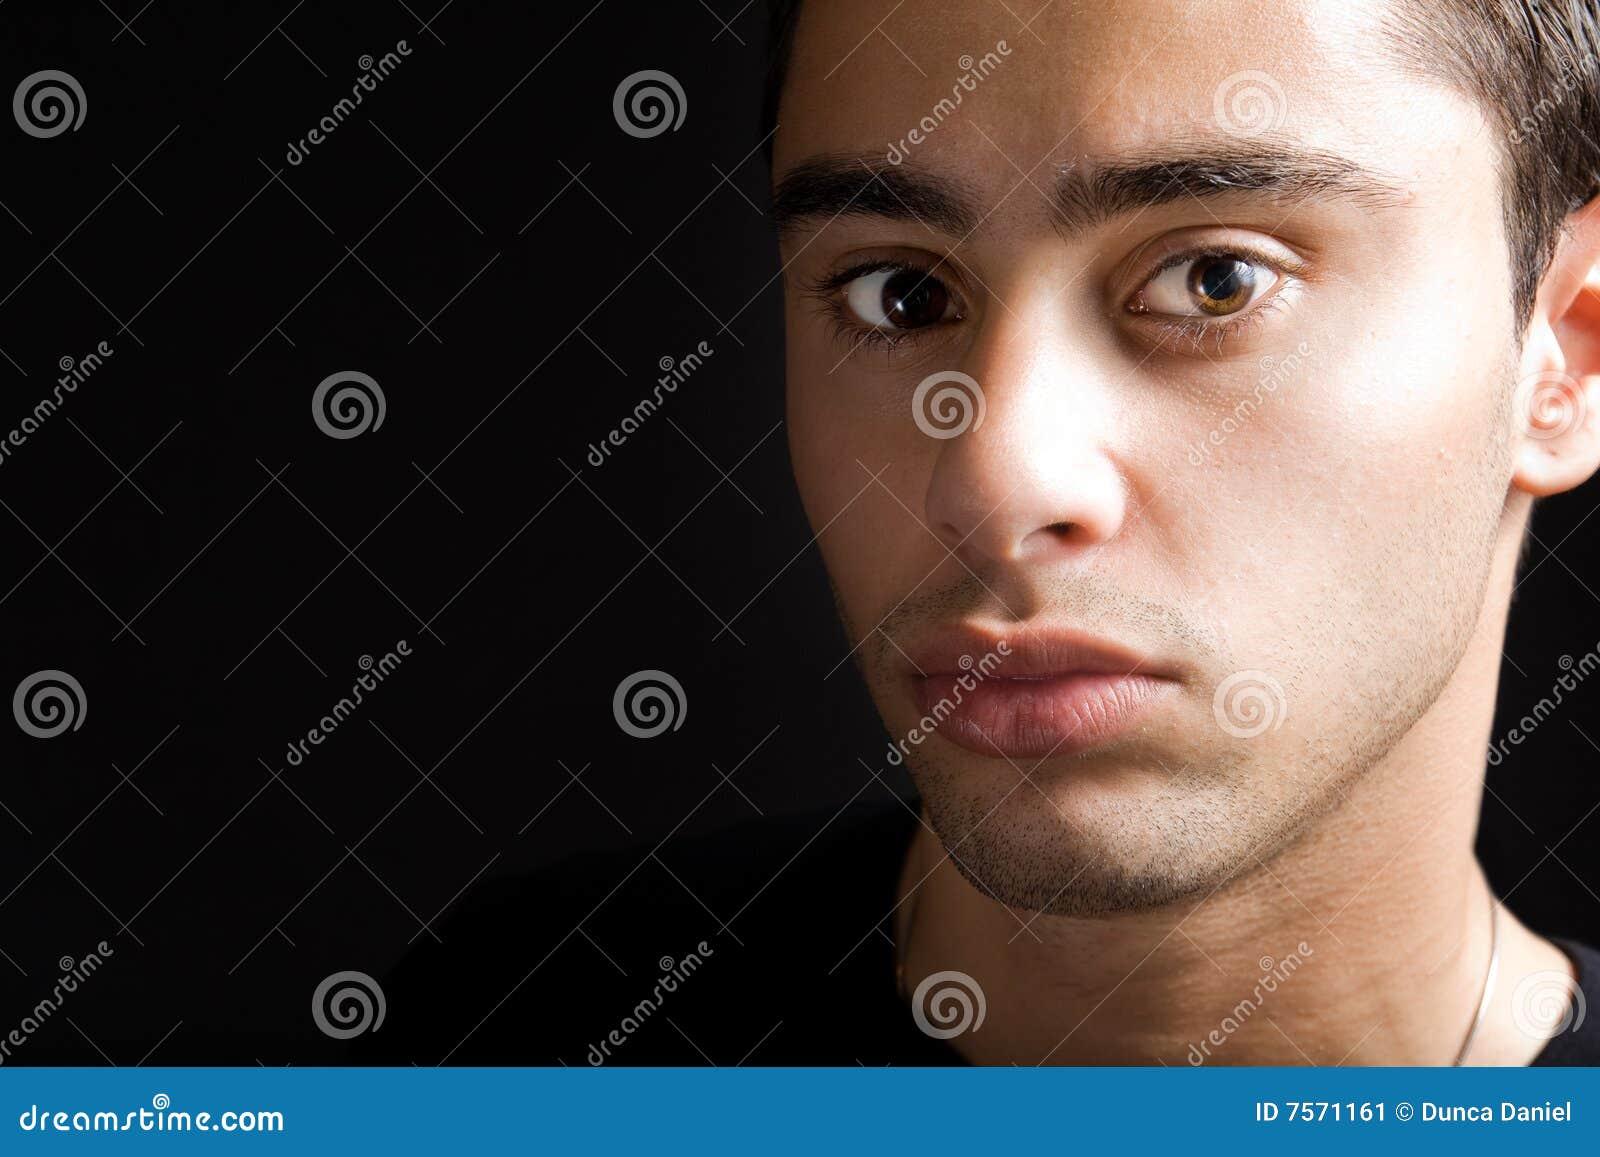 Young hispanic man with sensual face